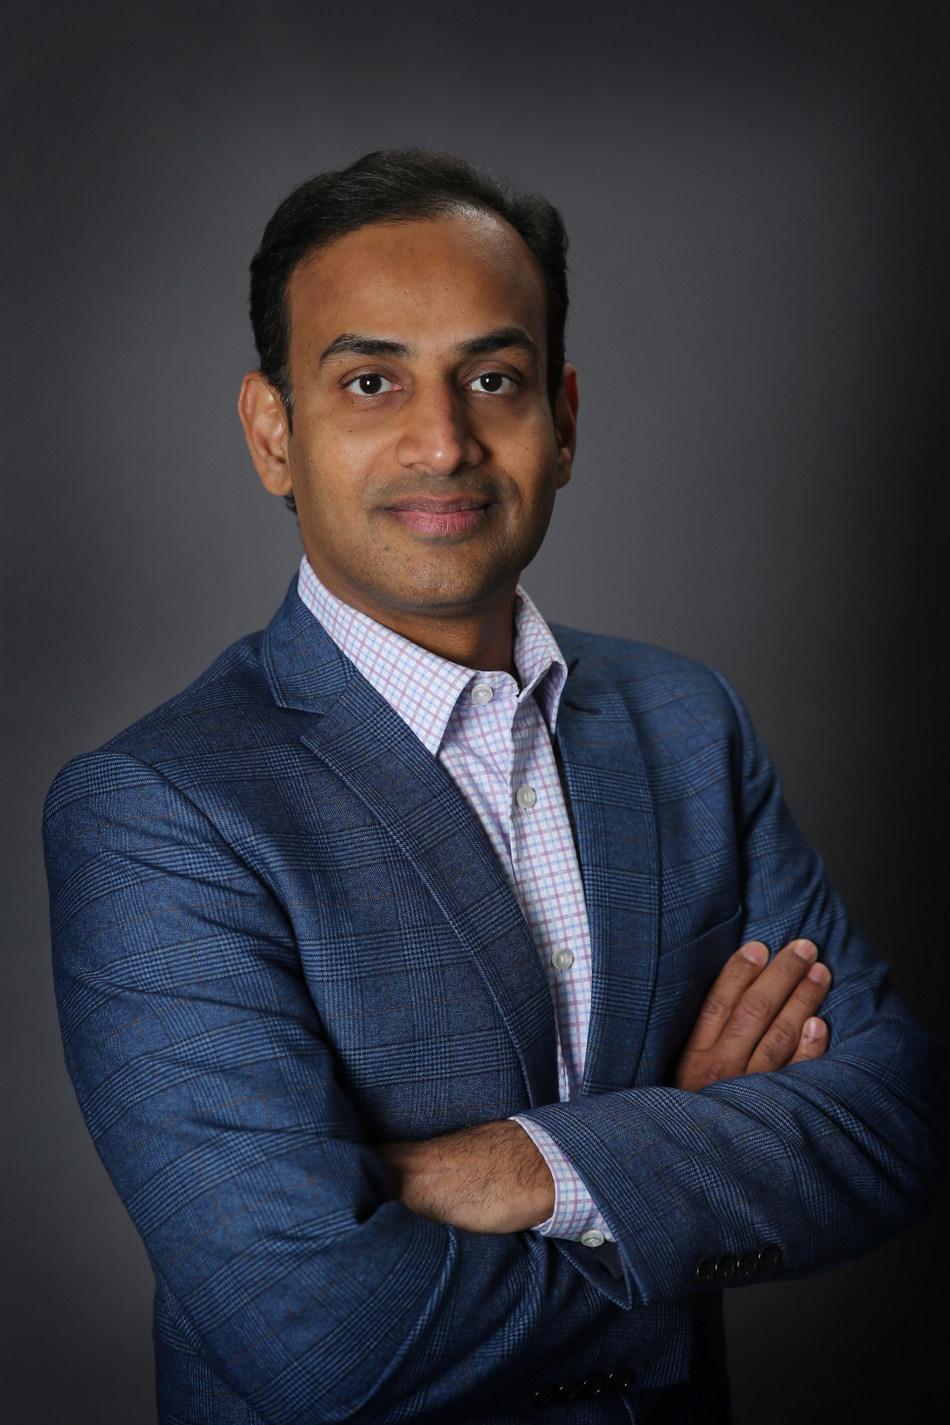 Sathish Muthukrishnan, Chief Information, Data and Digital Officer, Ally Financial